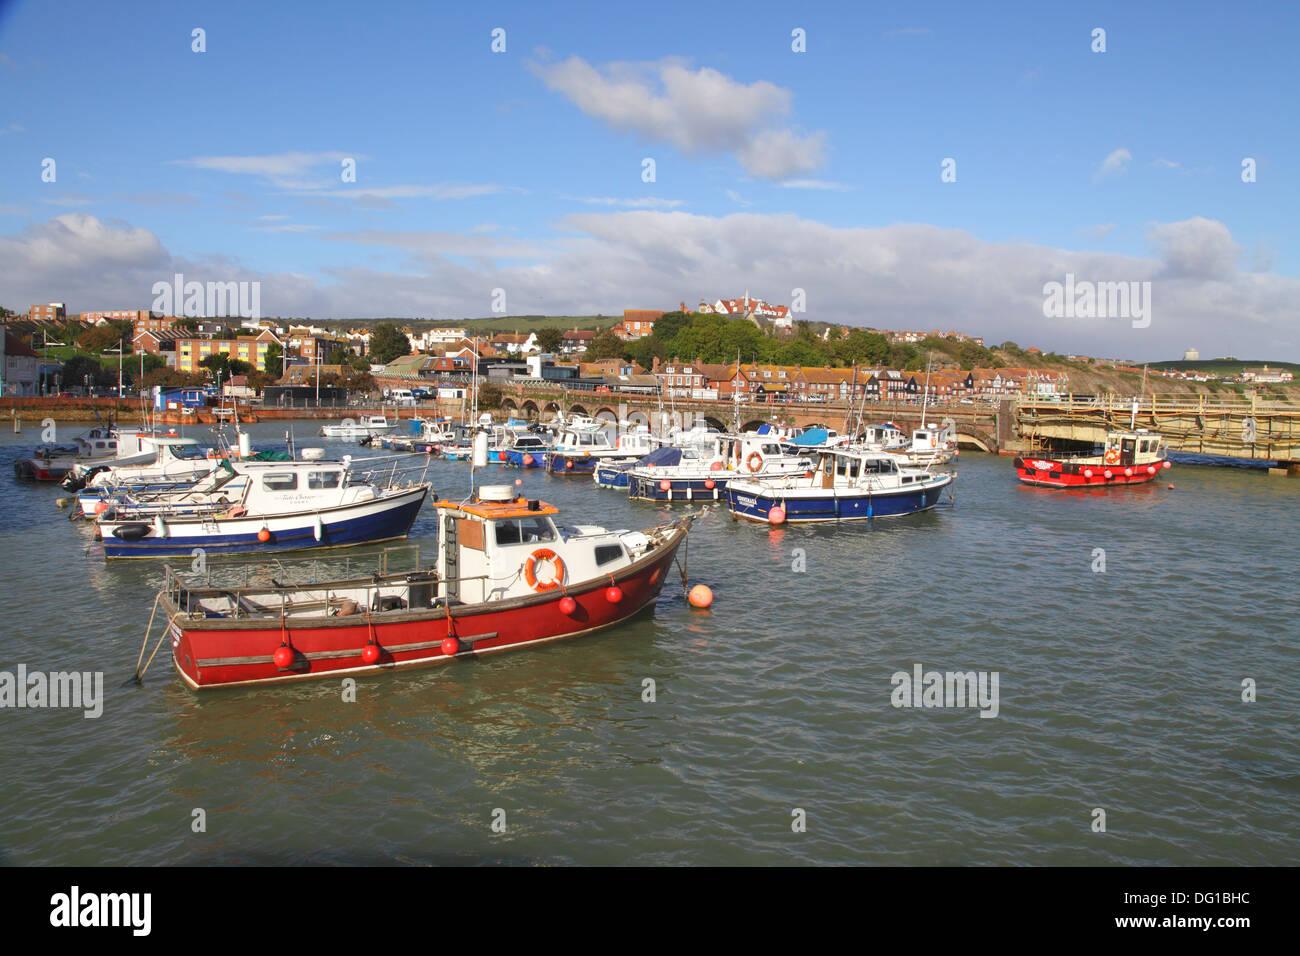 Fishing boats in Folkestone Harbour Kent England UK - Stock Image